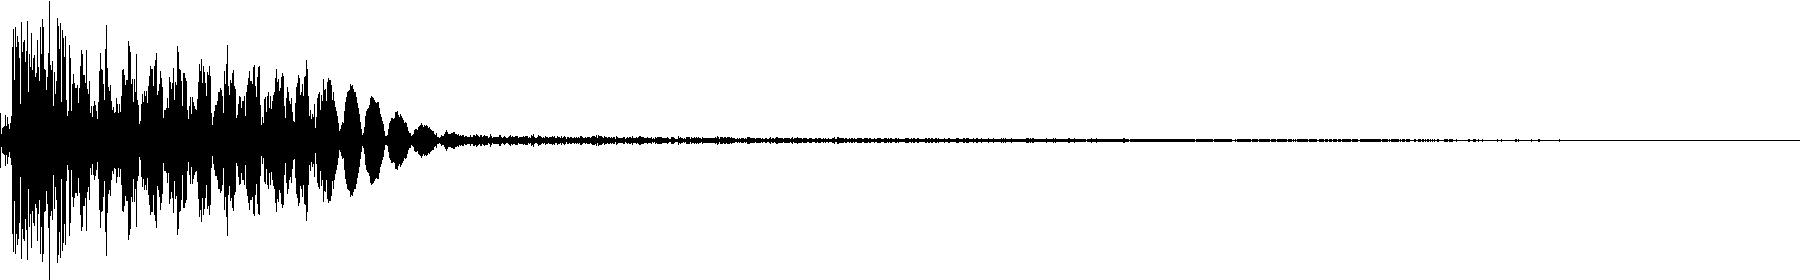 vedh synth cut 047 gm